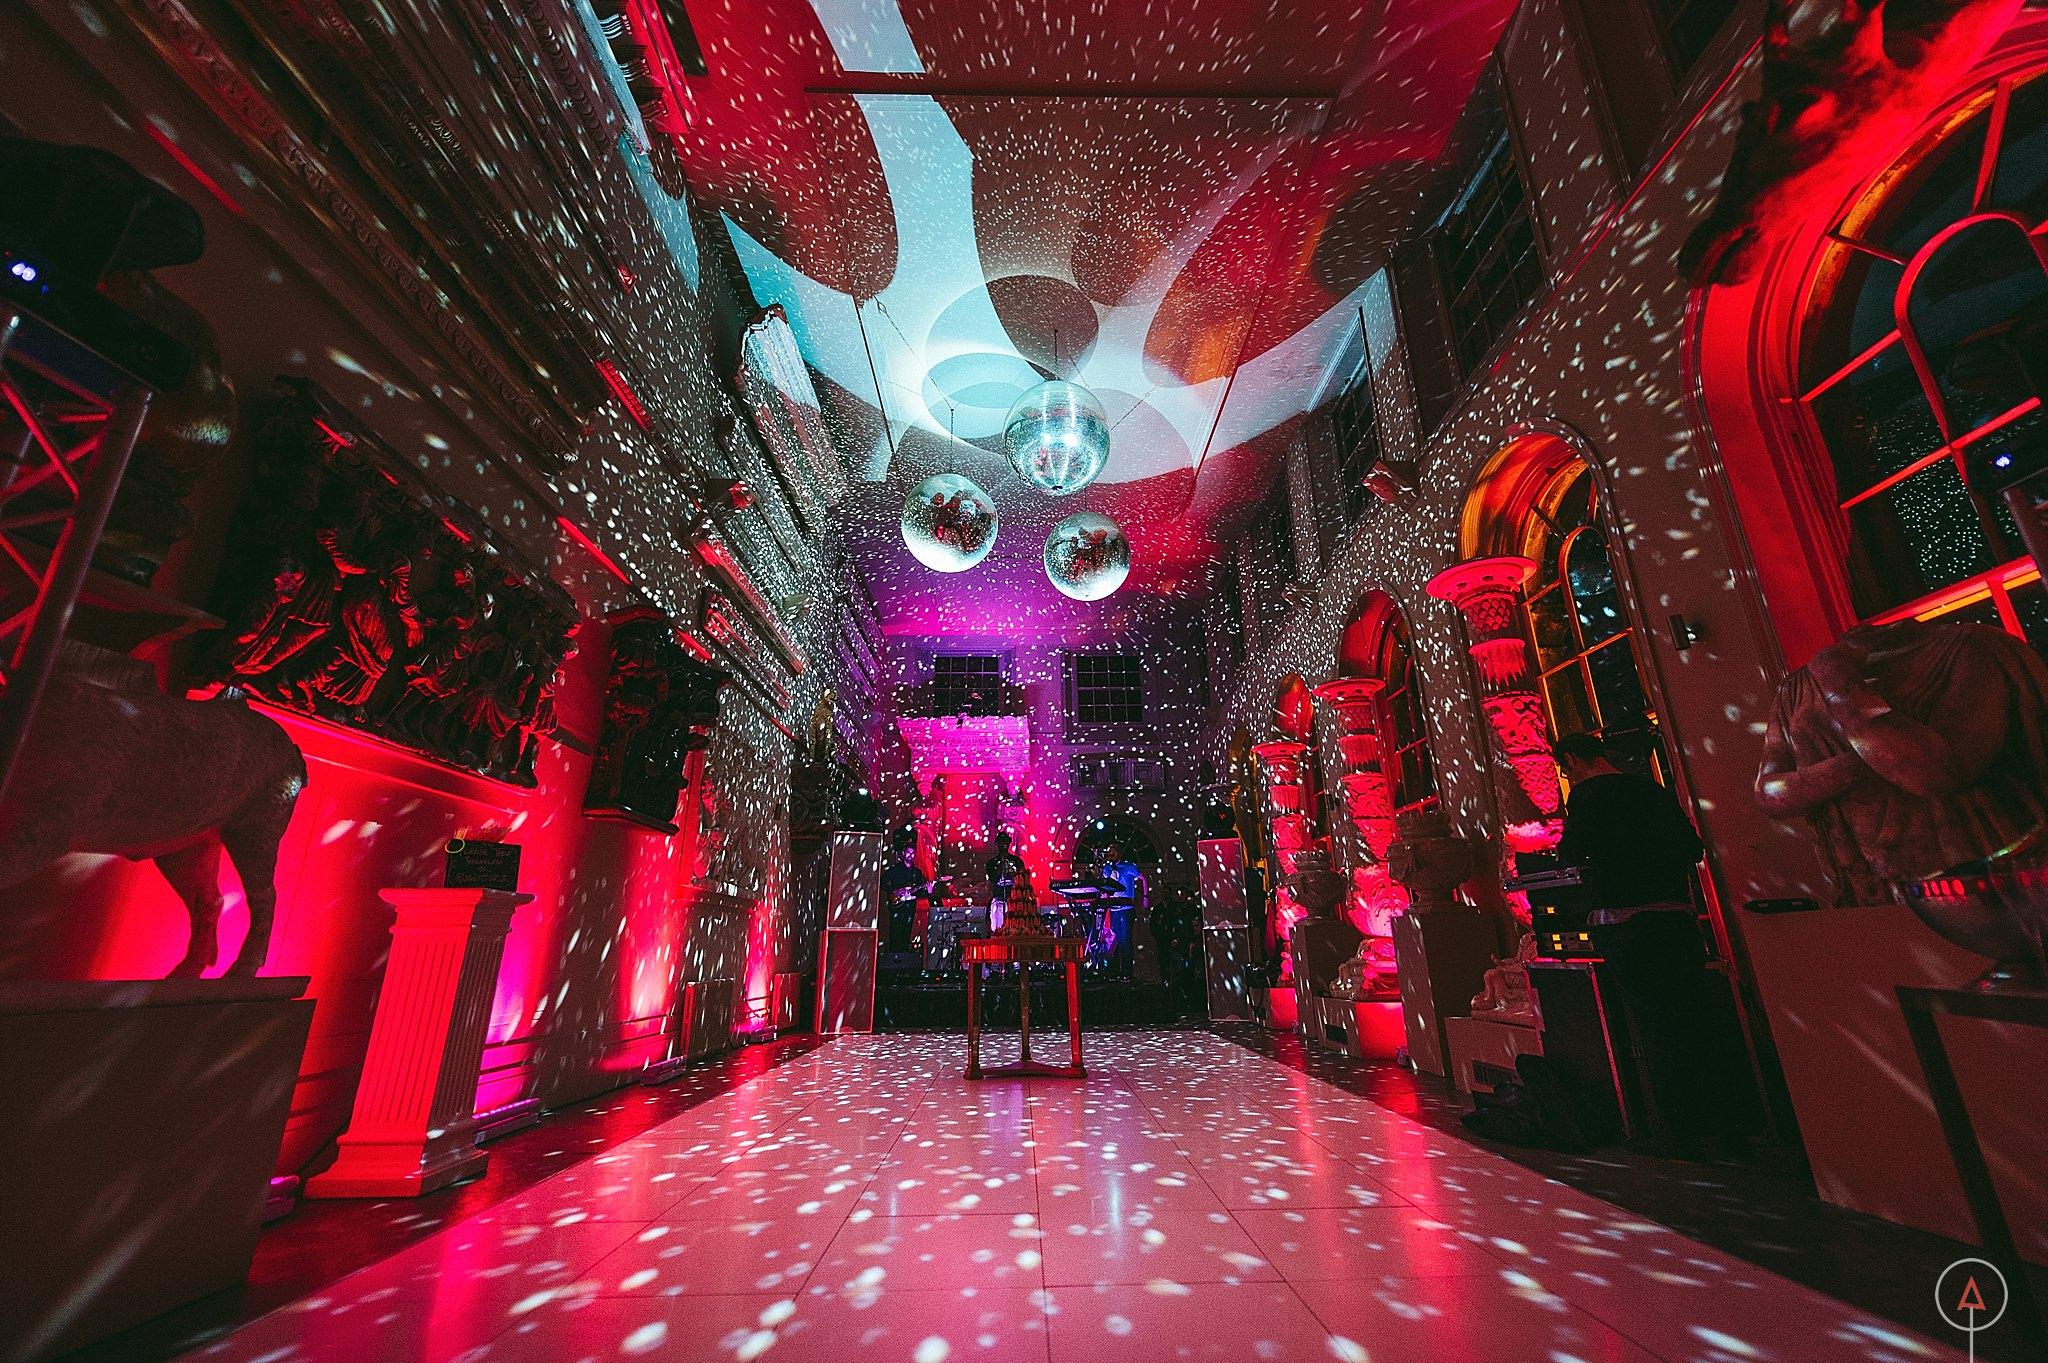 cardiff-wedding-photographer-aga-tomaszek_0307